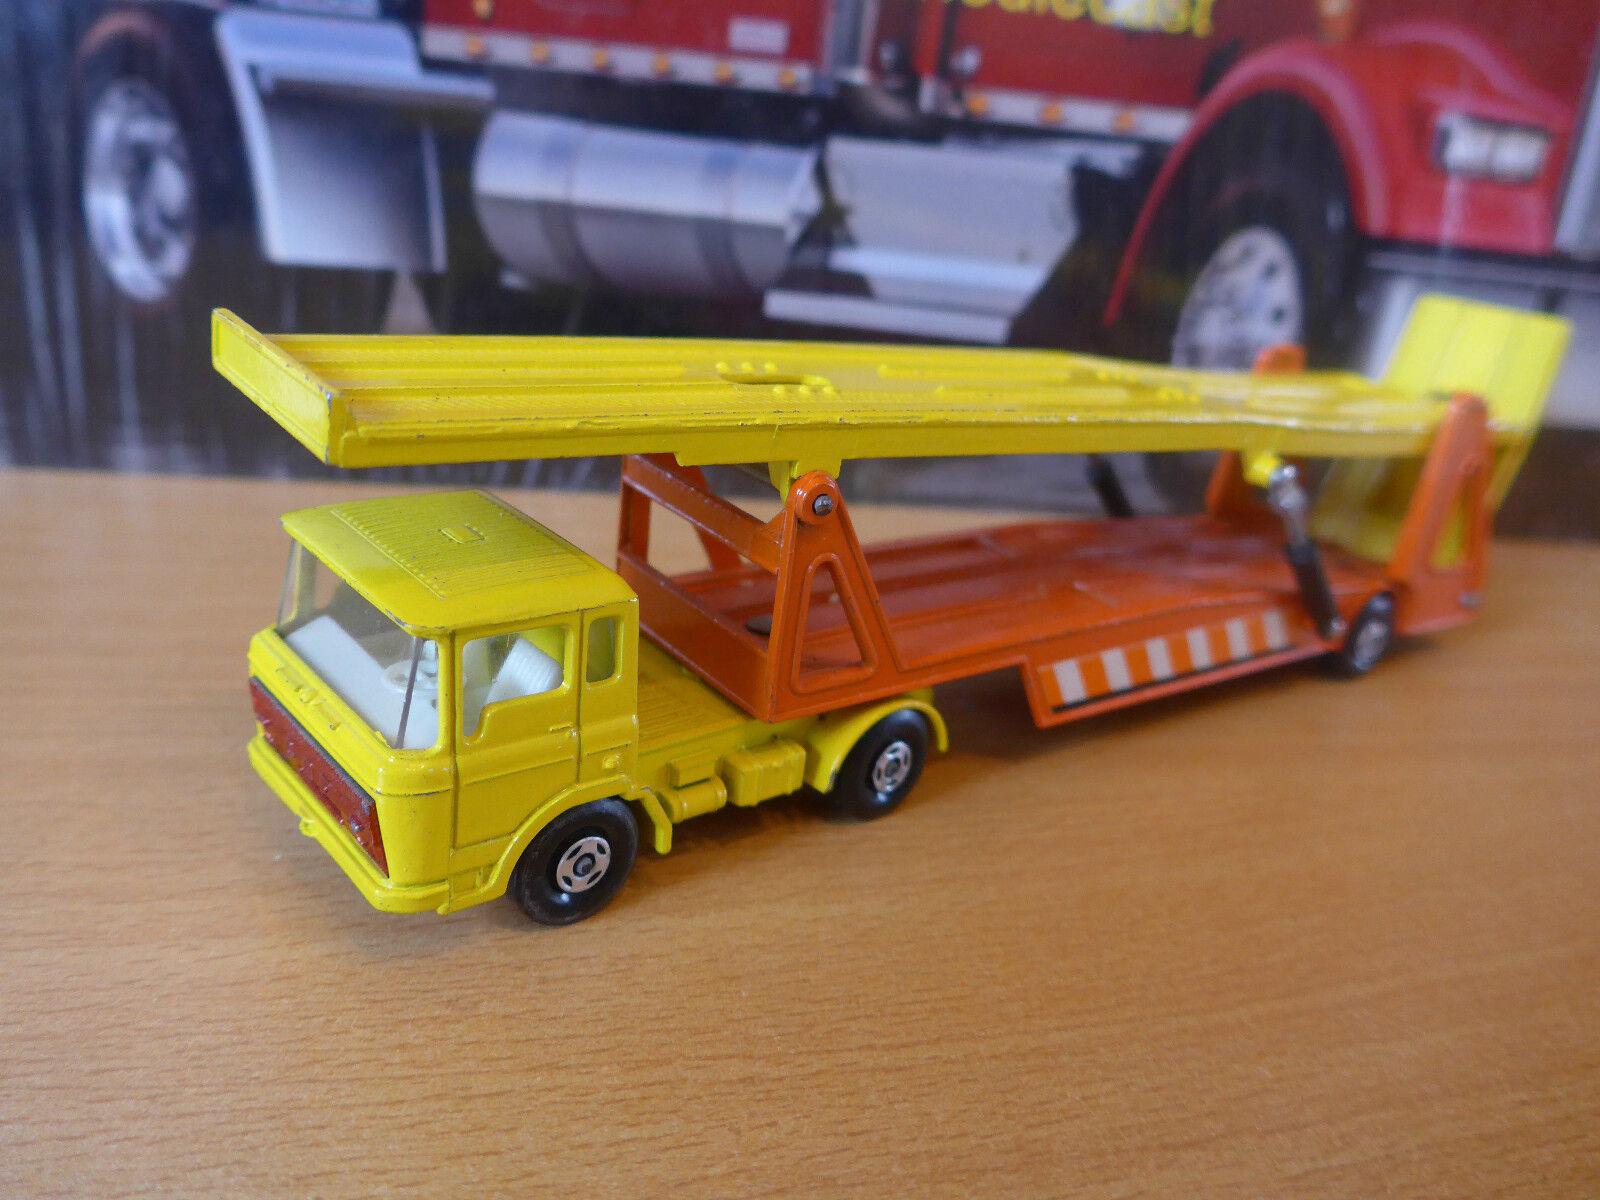 Matchbox-Superkings K11Daf car transporter made in England by Lesney 1970